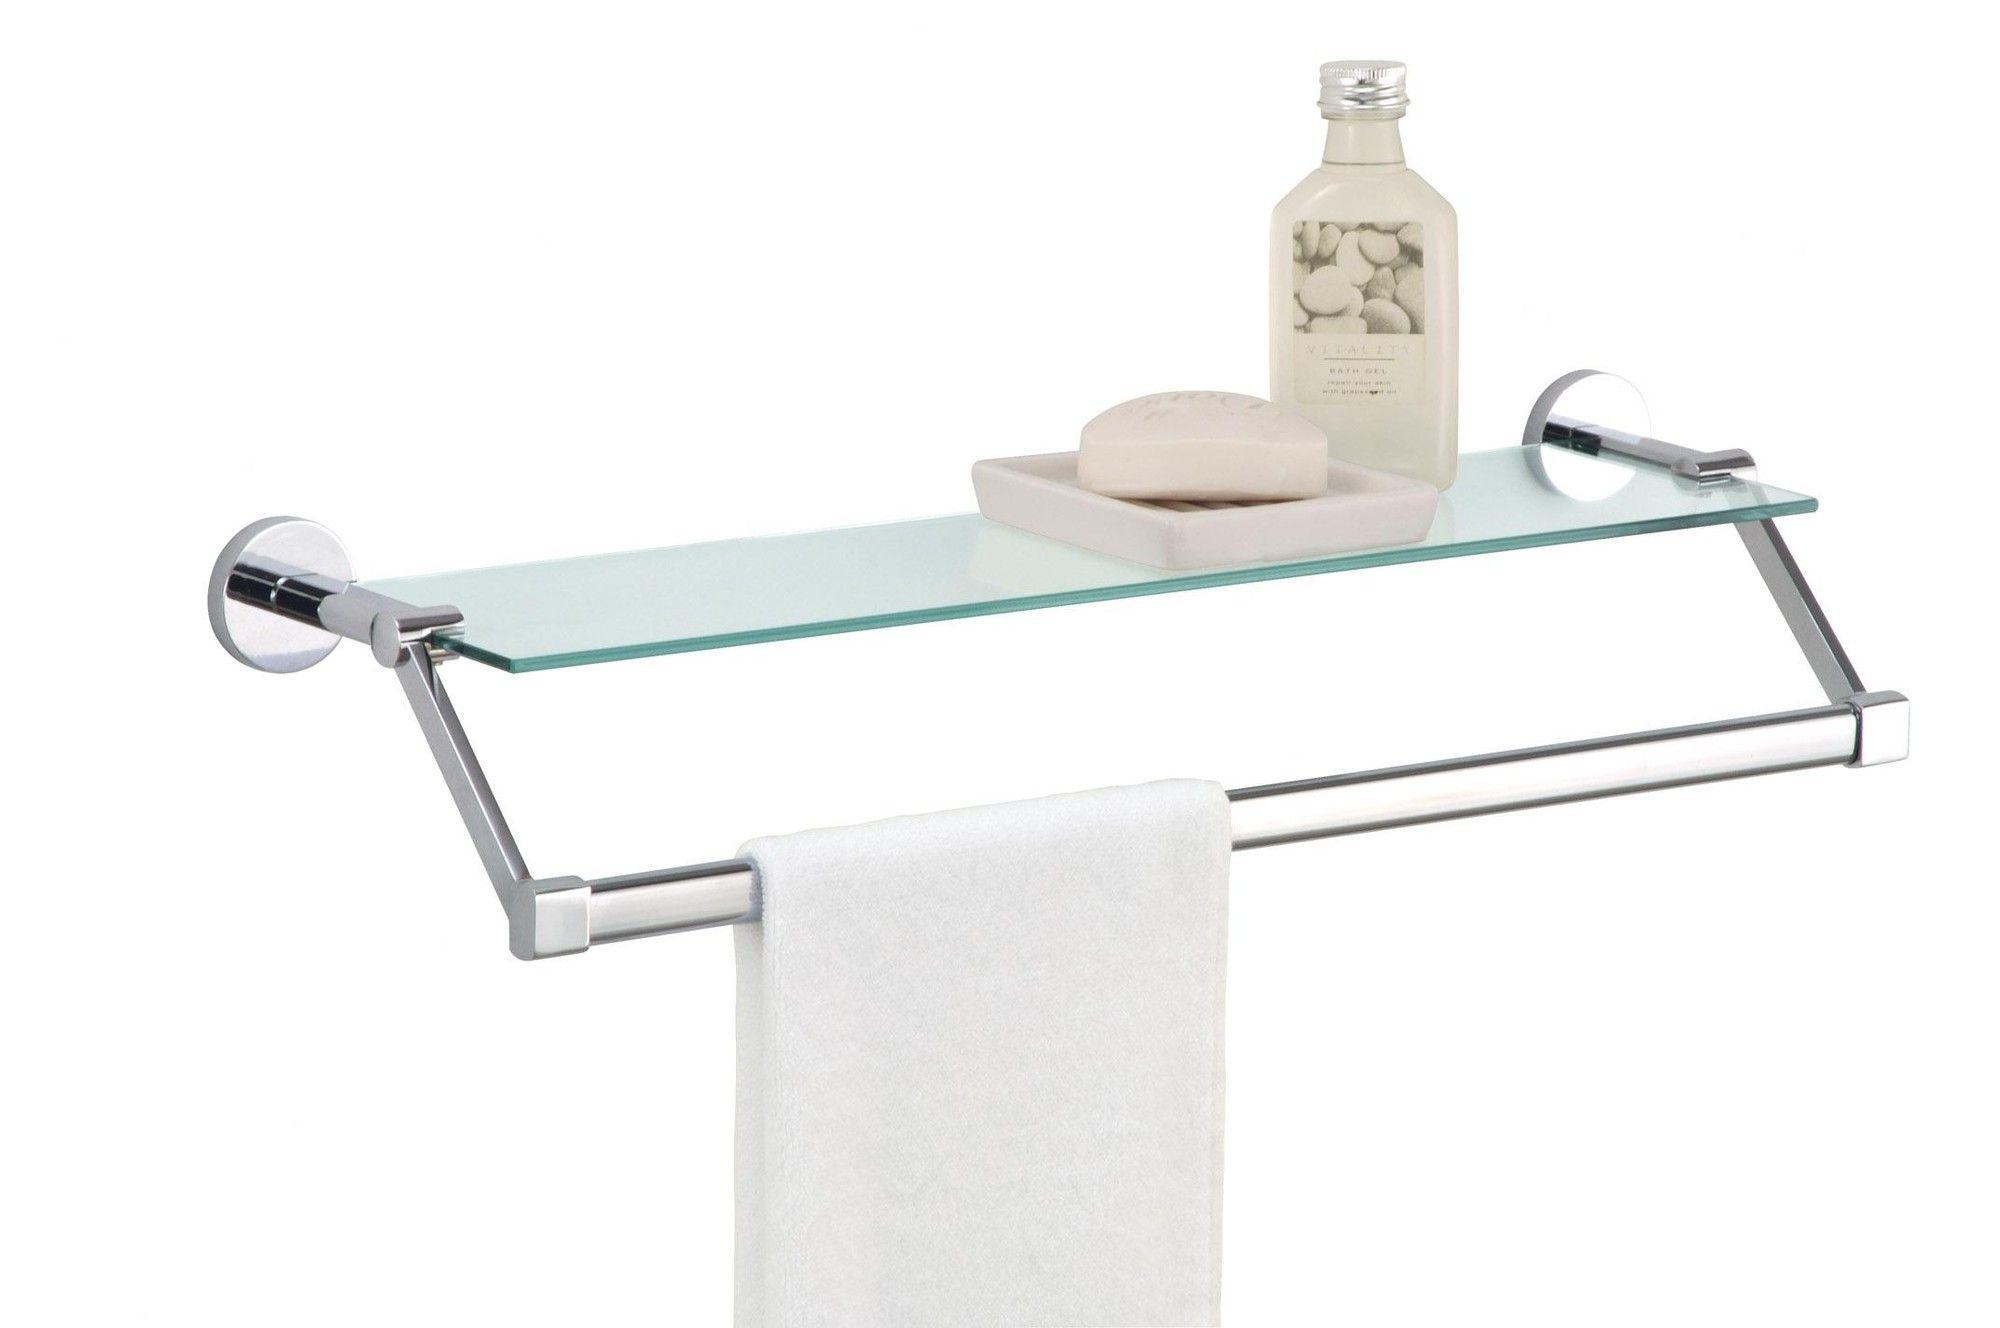 Bathroom towel bar with shelf | Bathroom shelves | Pinterest | Glass ...